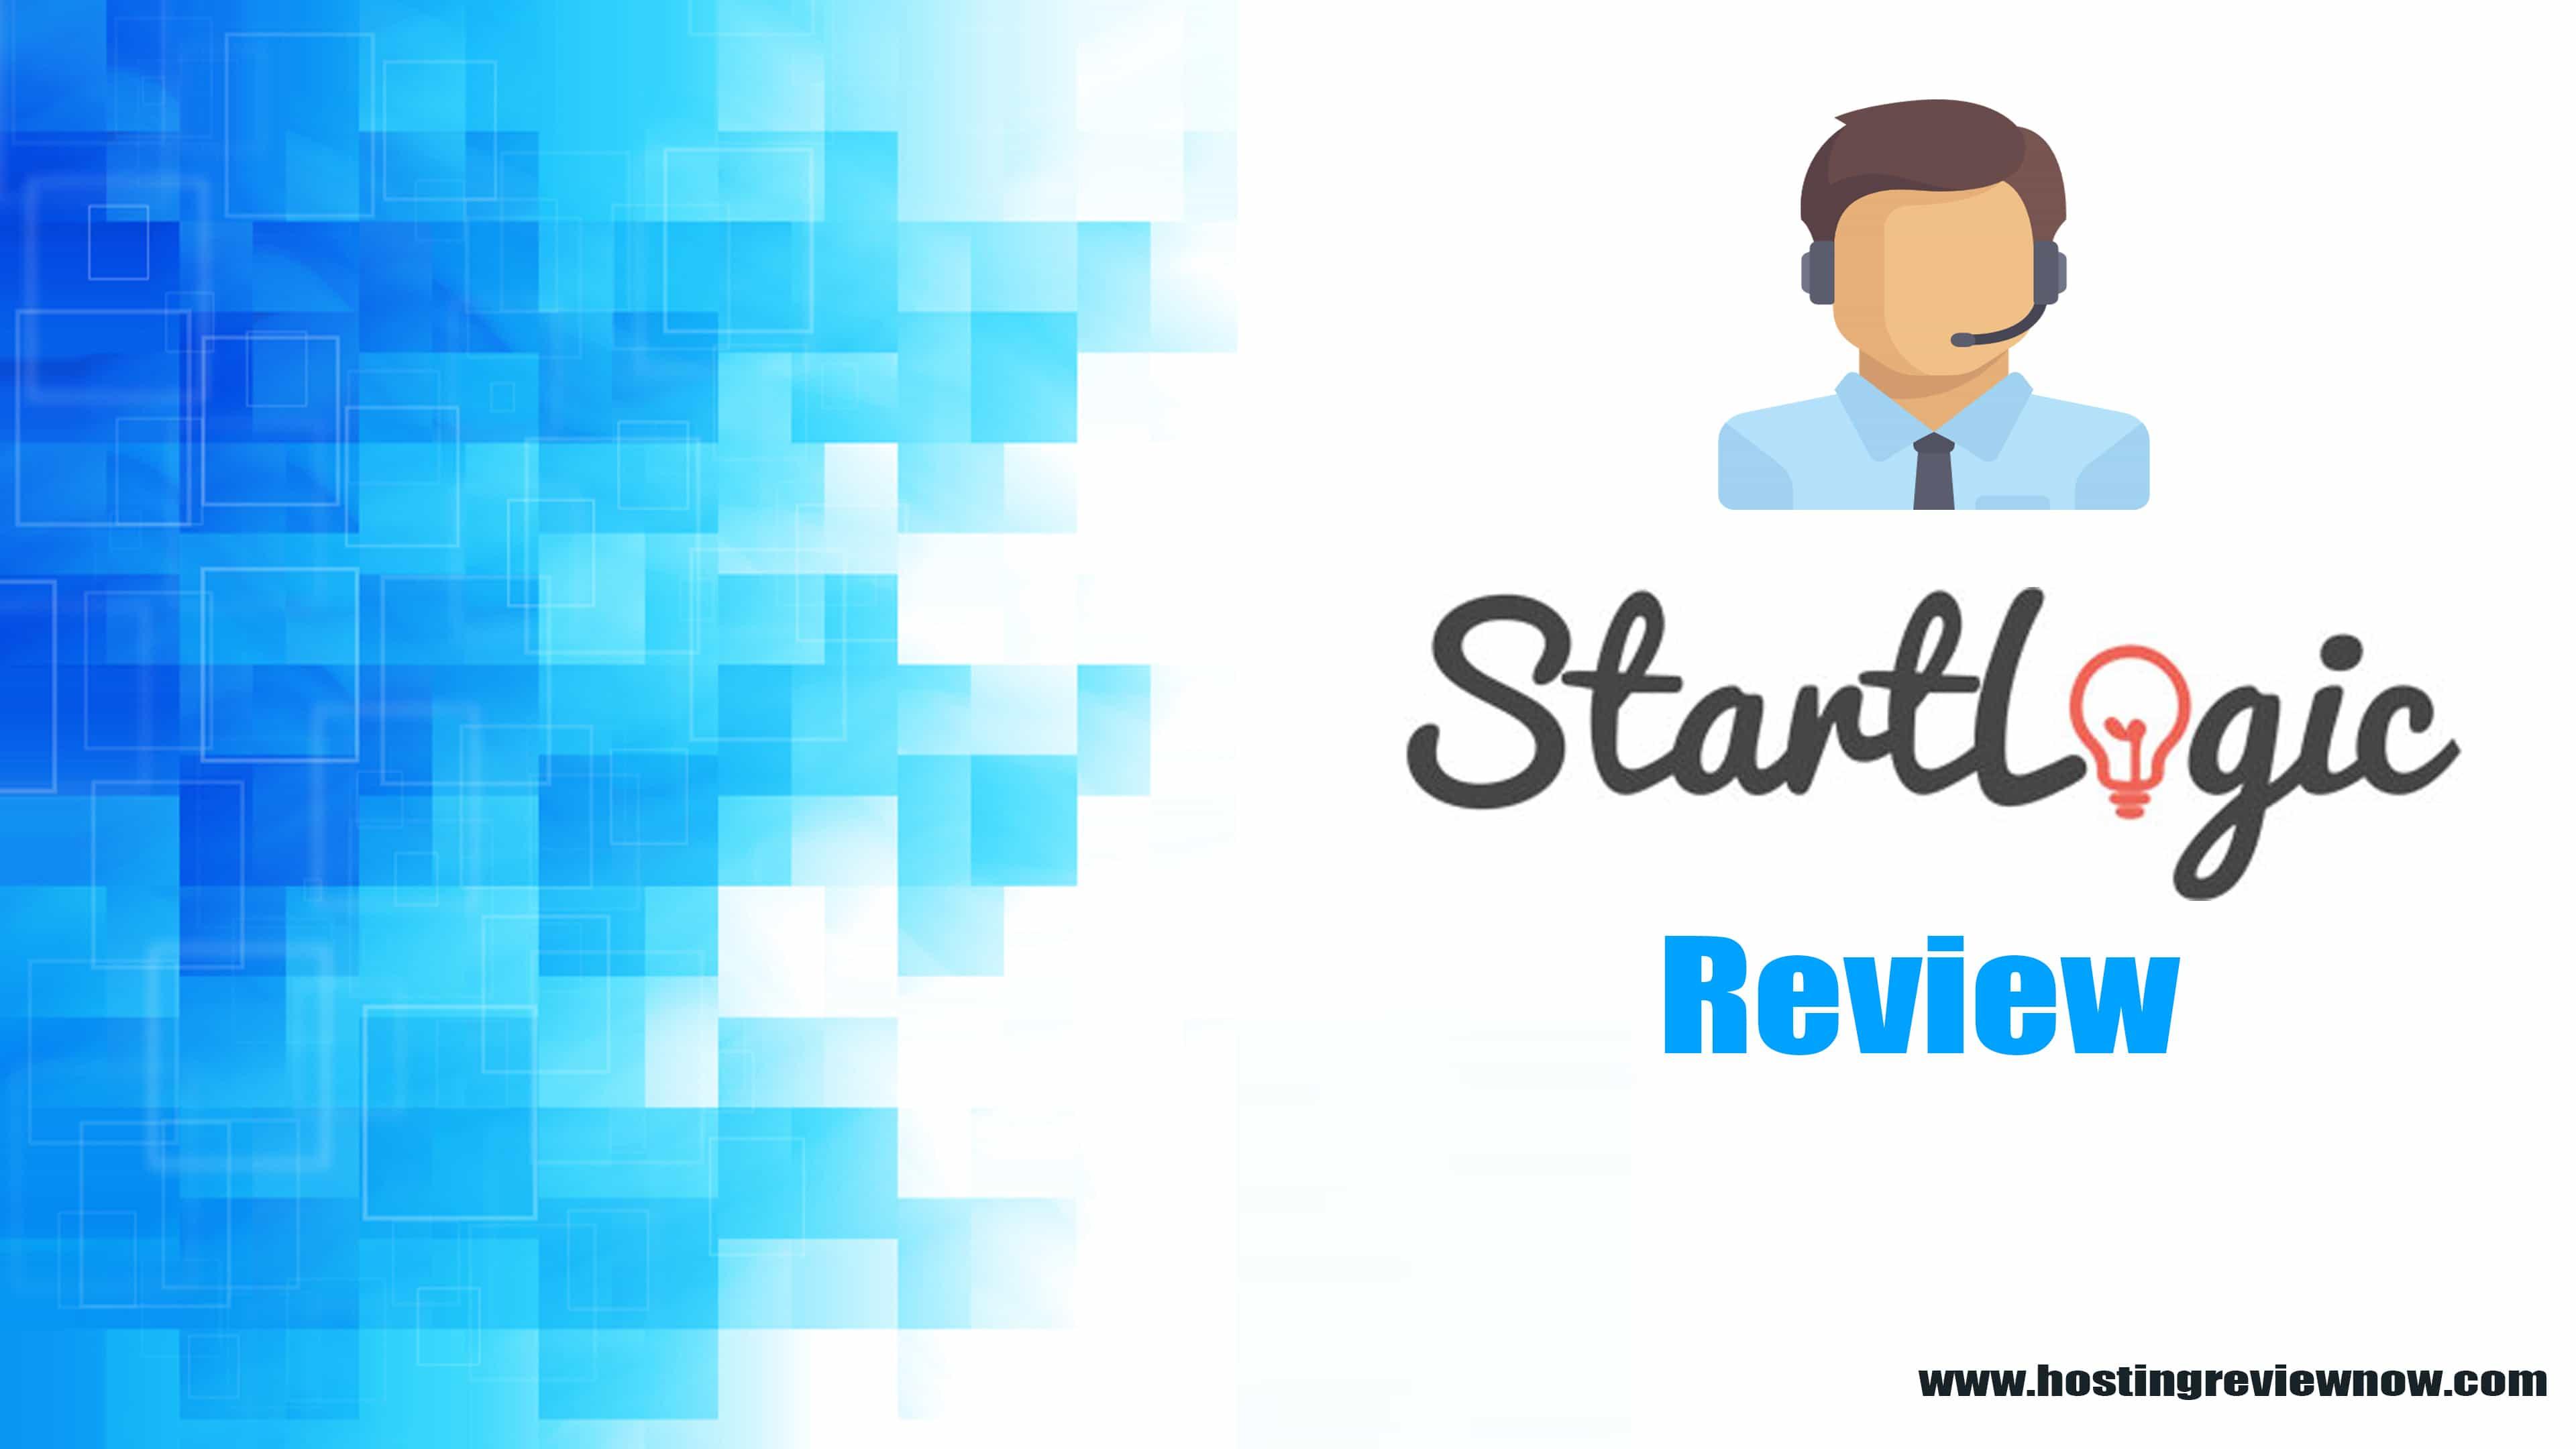 StartLogic Hosting Review 2018: A Reliable Web Hosting Provider